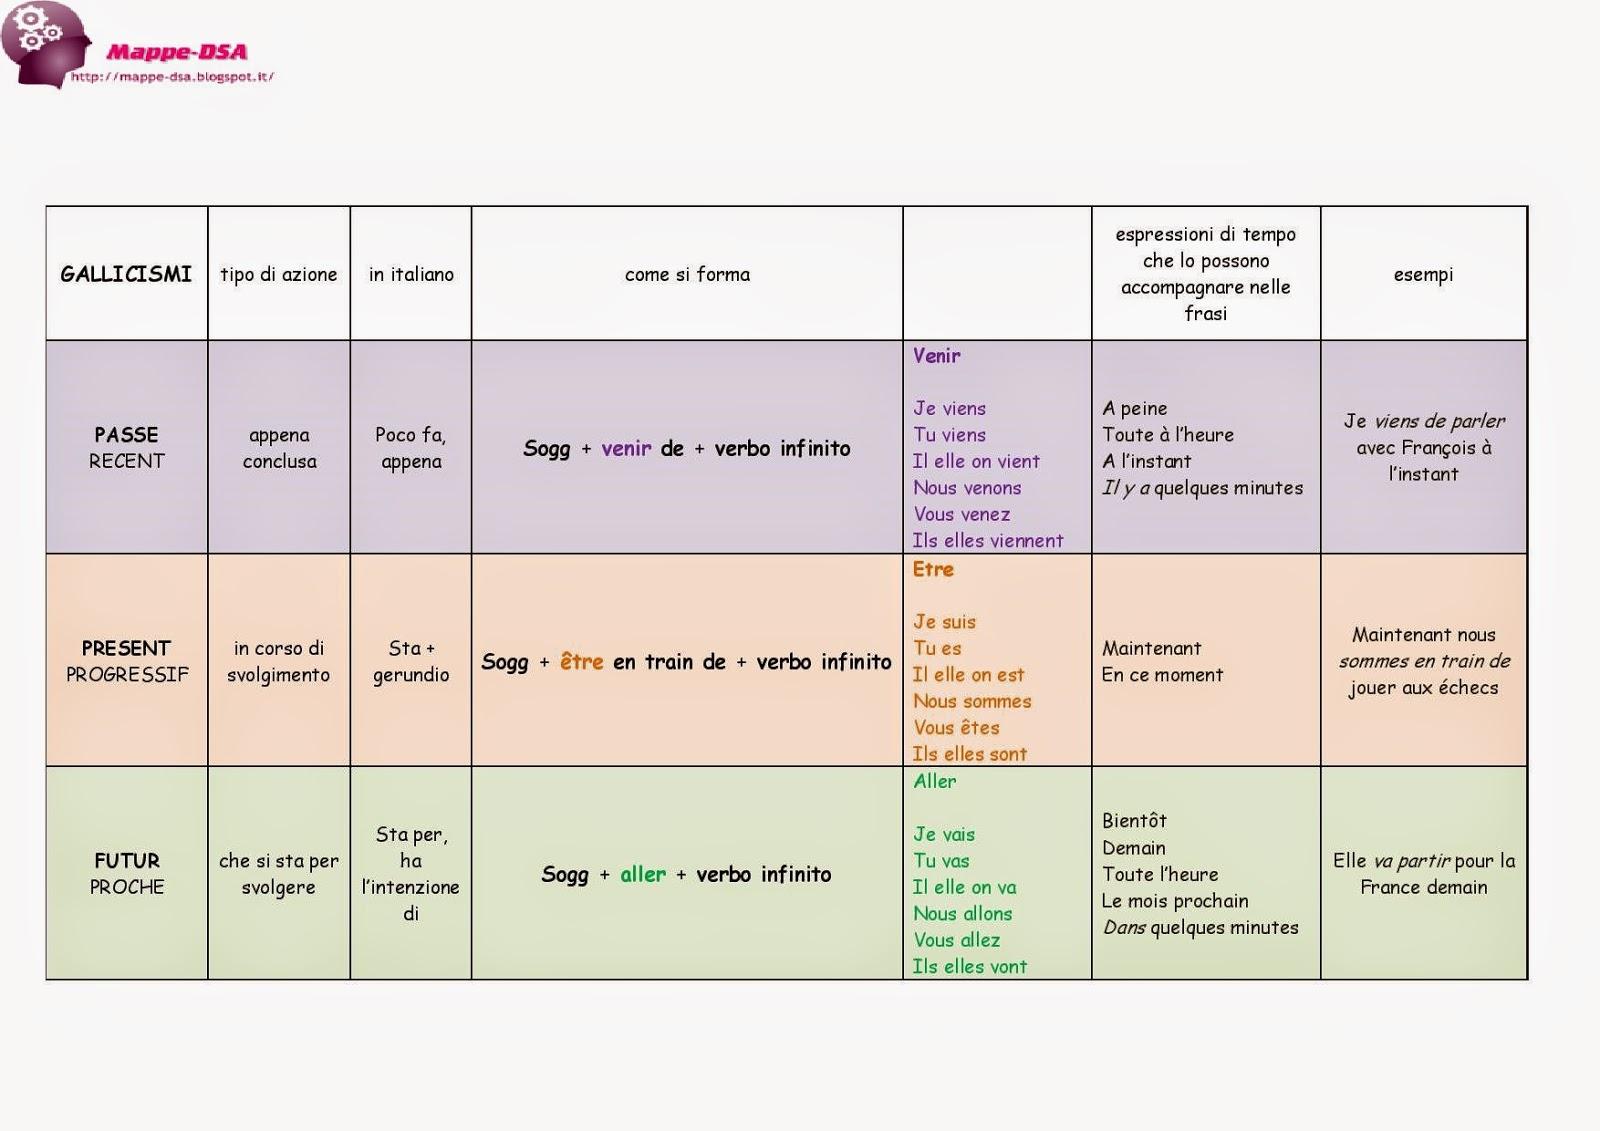 mappa tabella francese gallicismi dsa